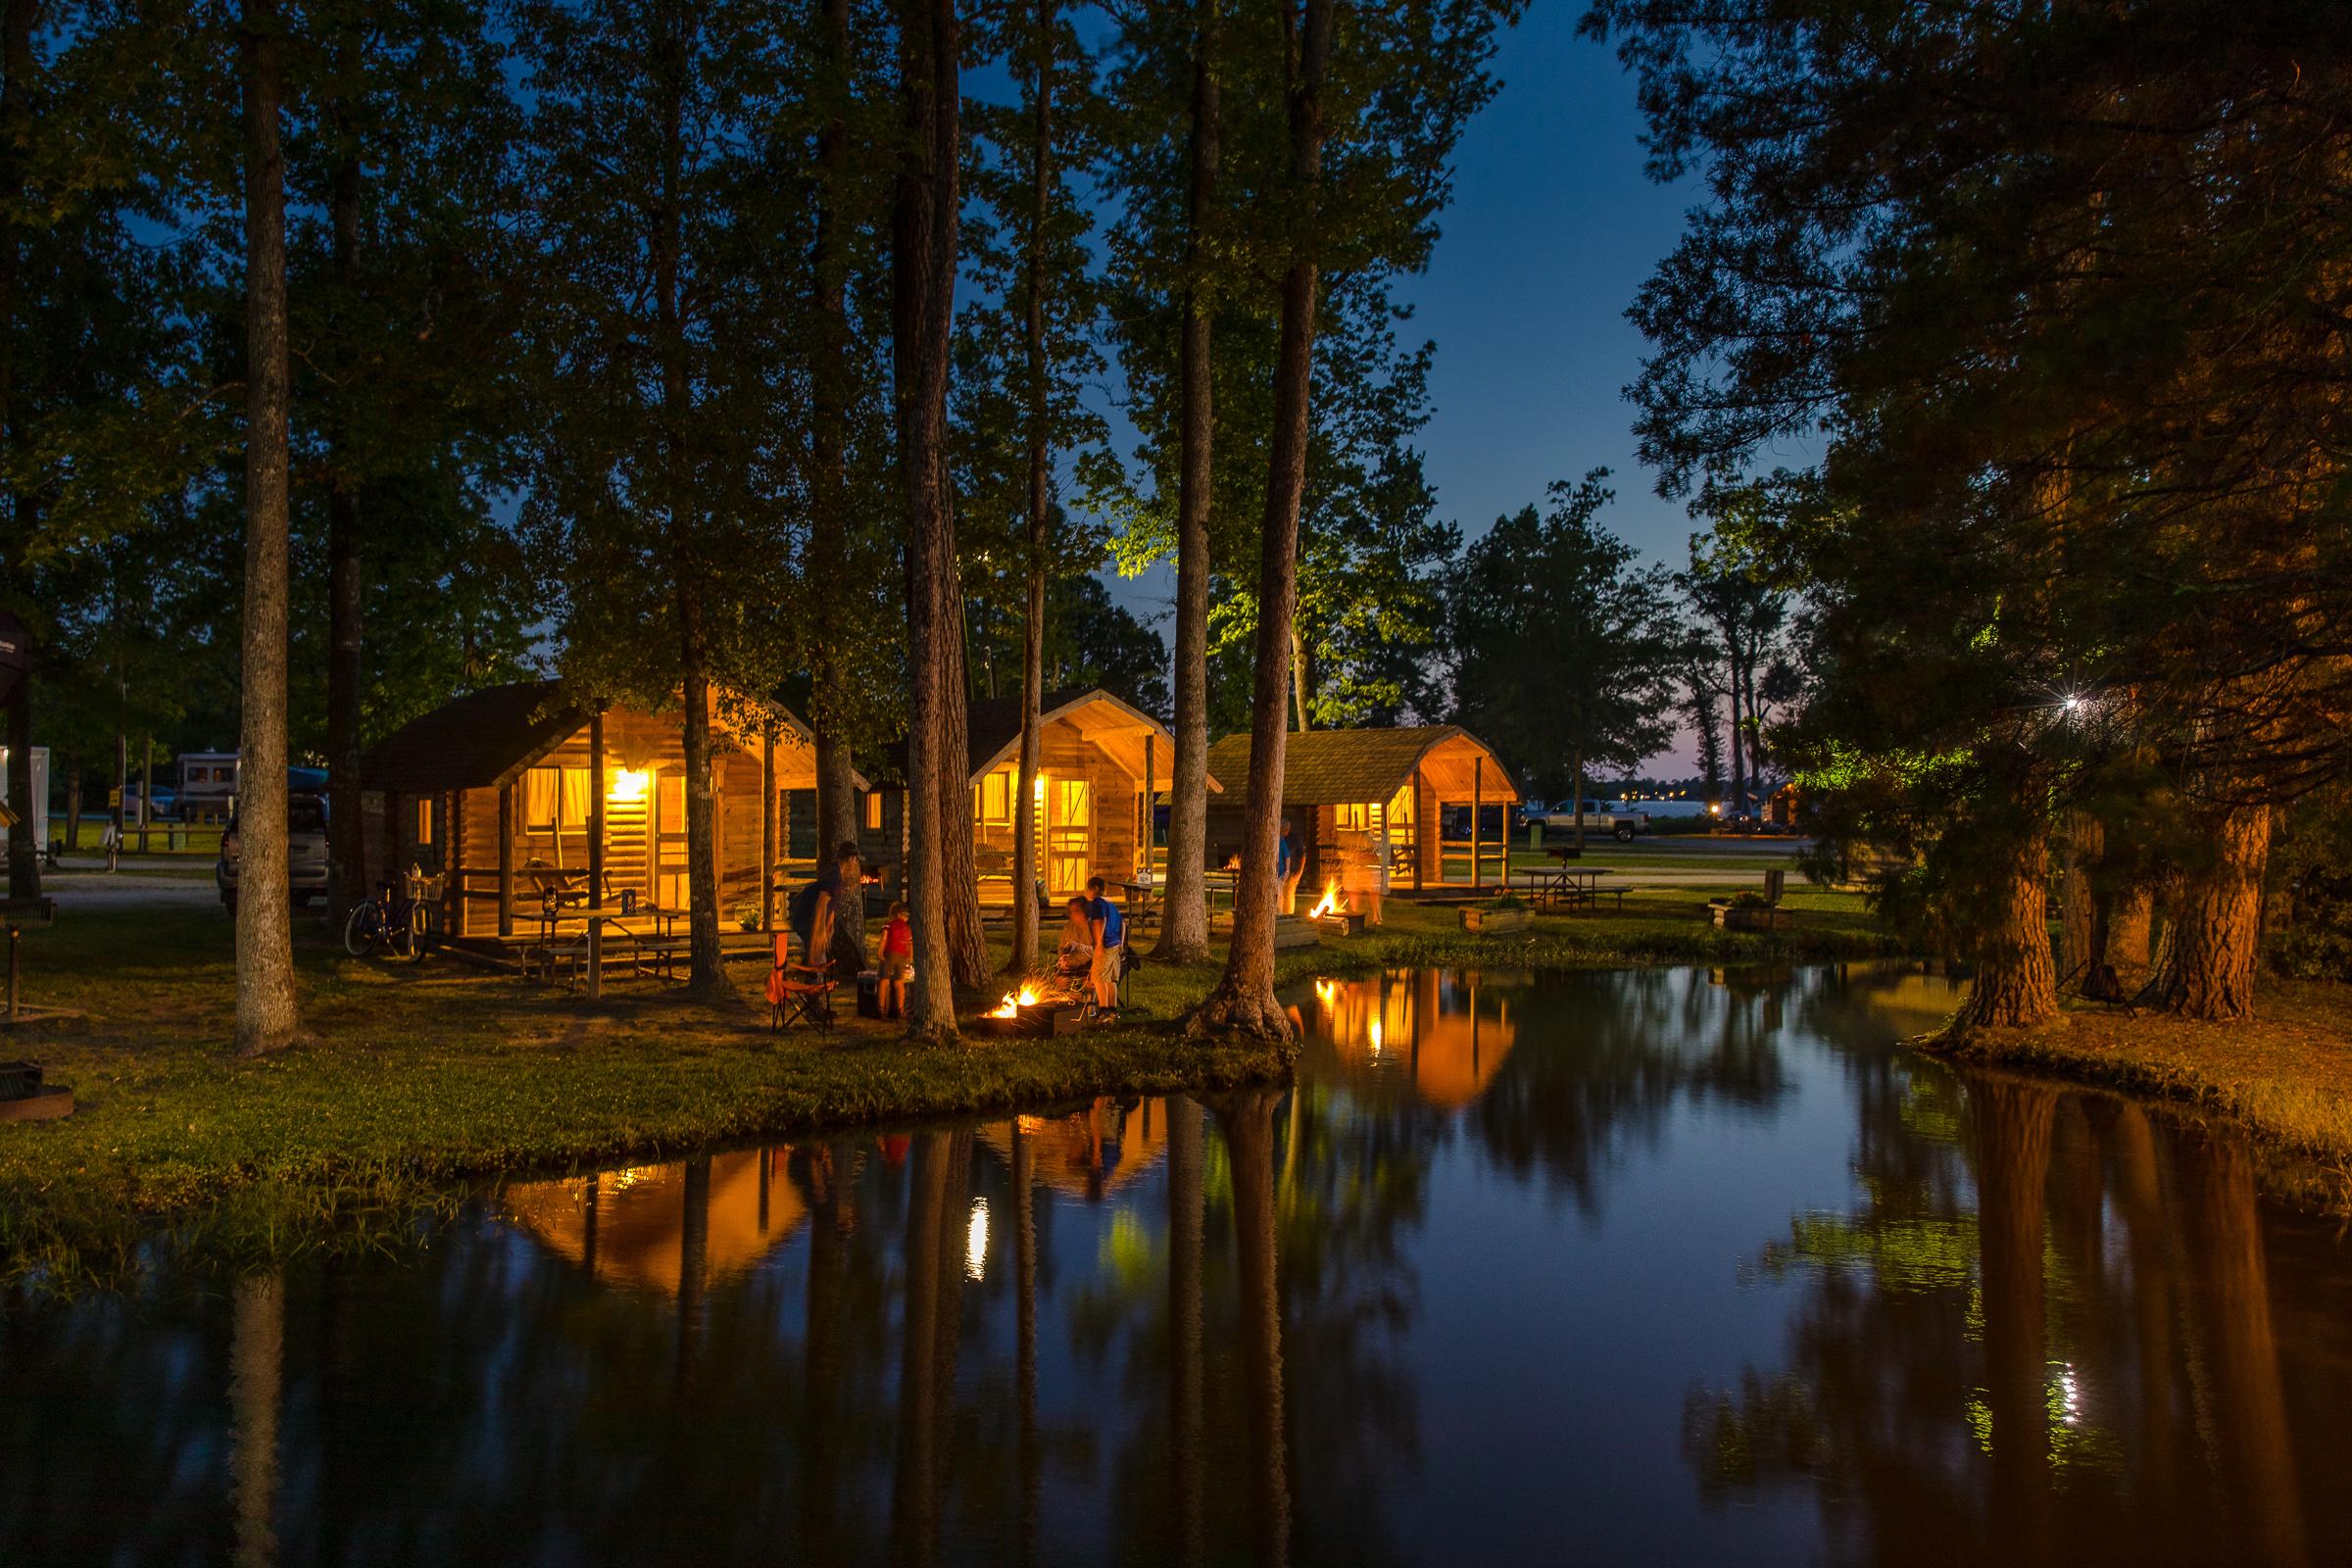 New Bern, North Carolina Campground | New Bern KOA Holiday